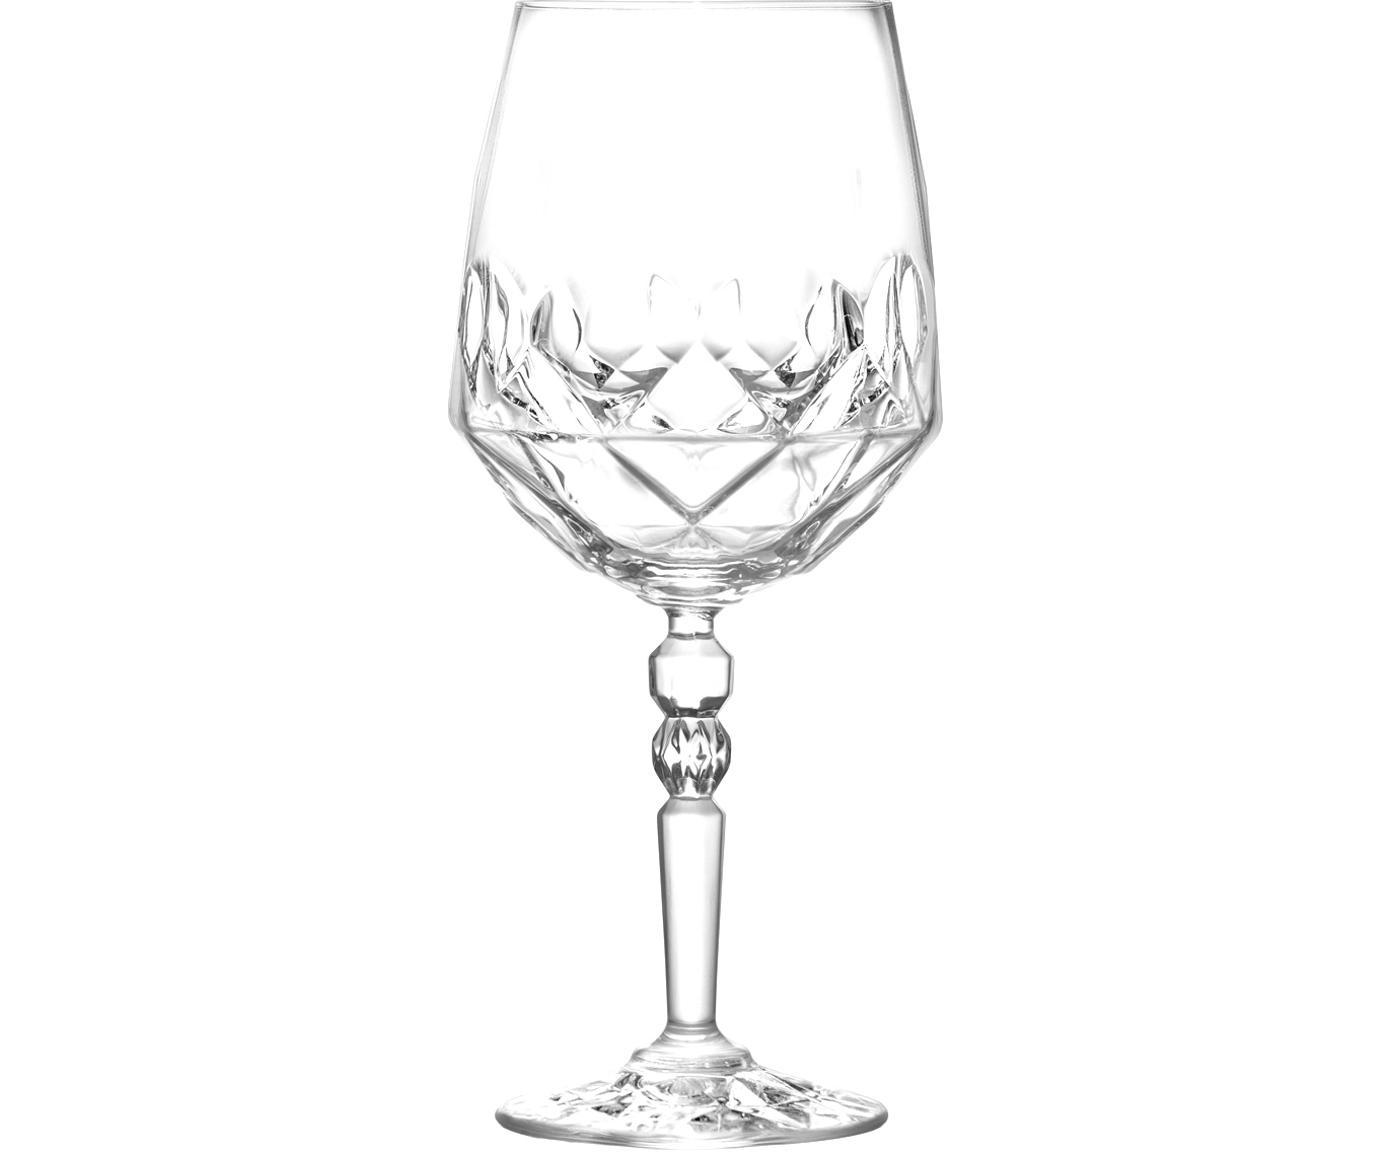 Kristallen witte wijnglazen Calicia, 6 stuks, Kristalglas, Transparant, Ø 10 x H 23 cm